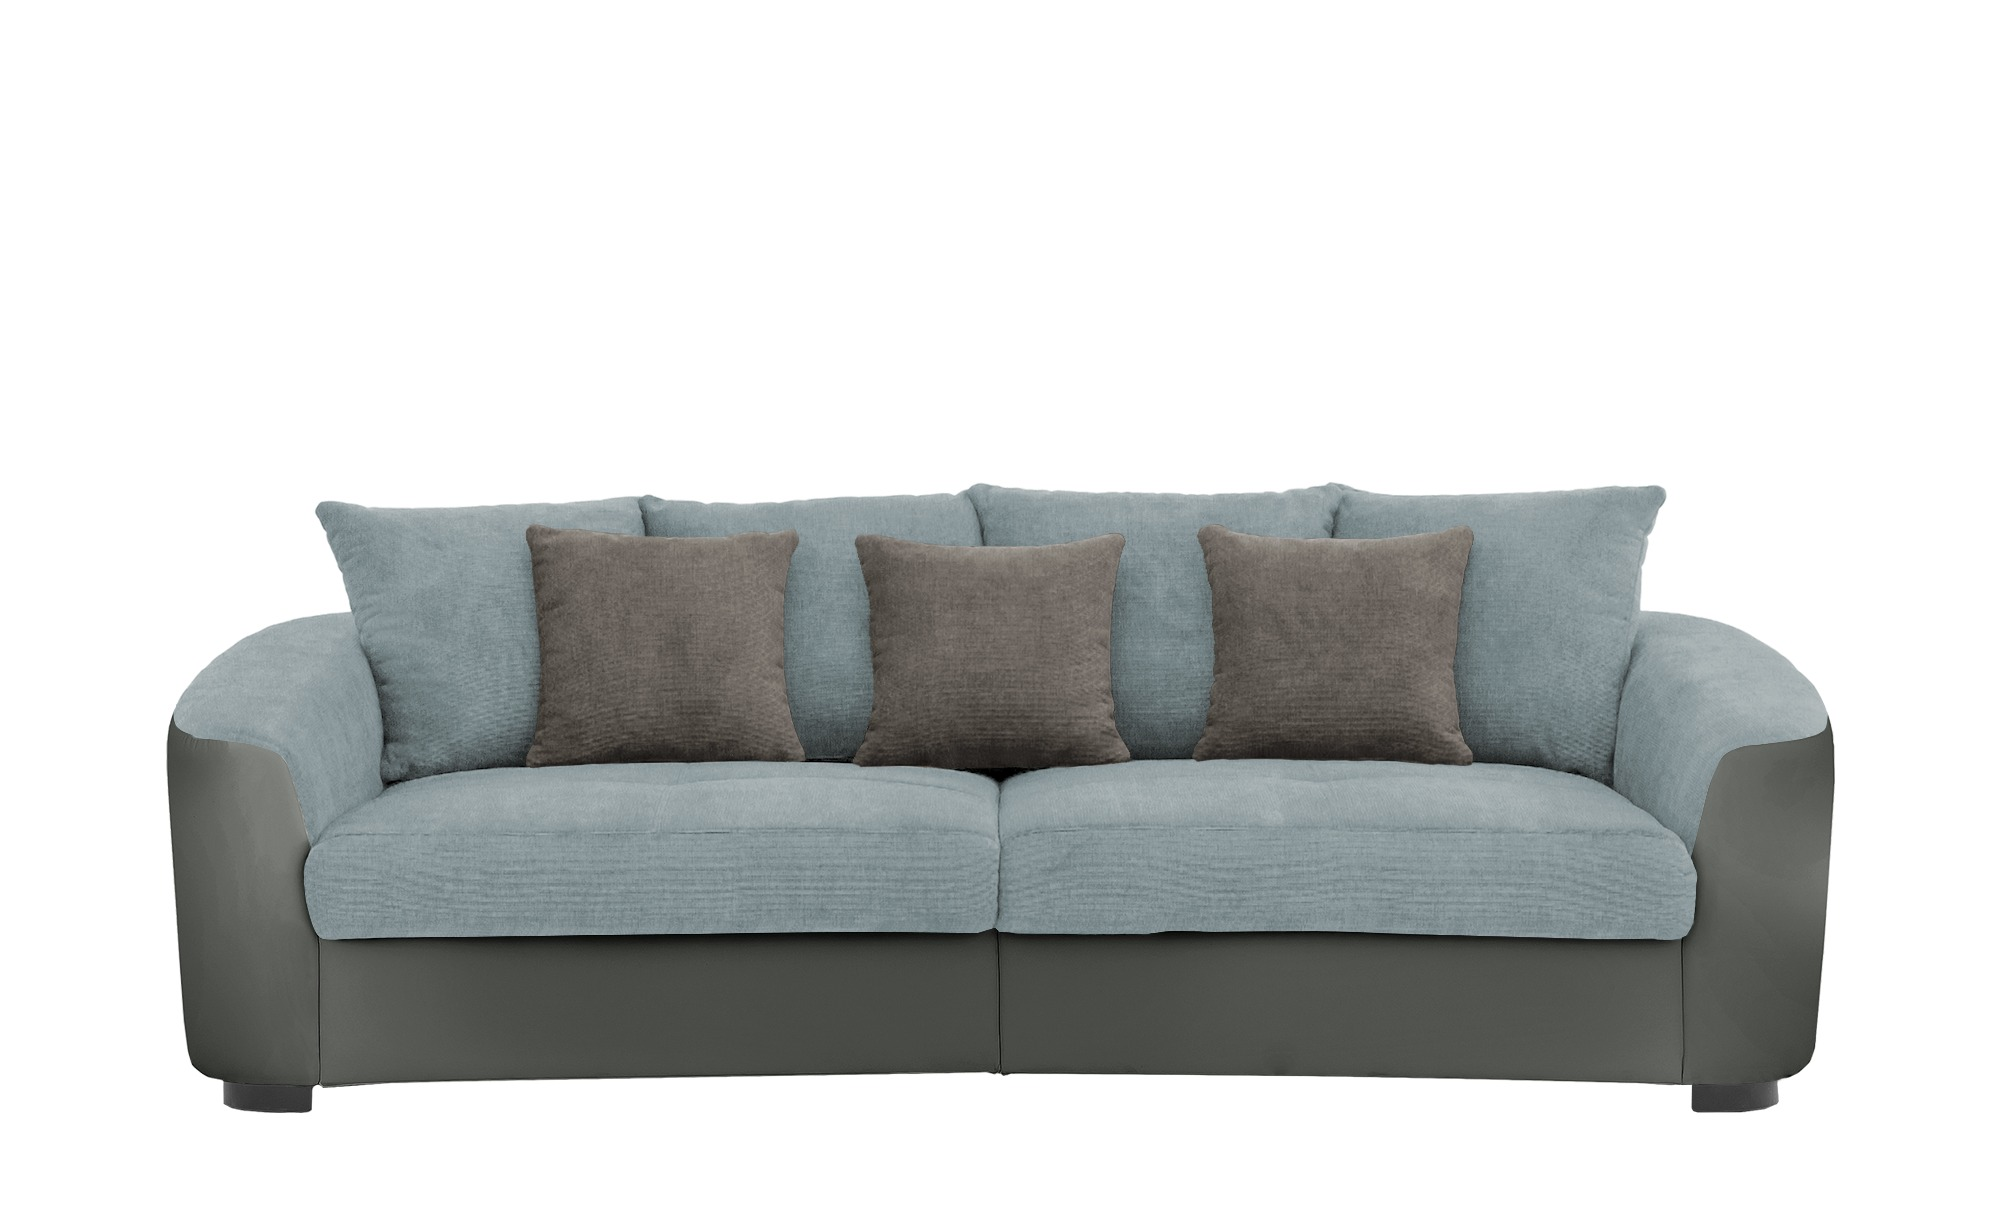 Big Sofa  Cancuun ¦ blau ¦ Maße (cm): B: 242 H: 62 T: 129 Polstermöbel > Sofas > Big-Sofas - Höffner